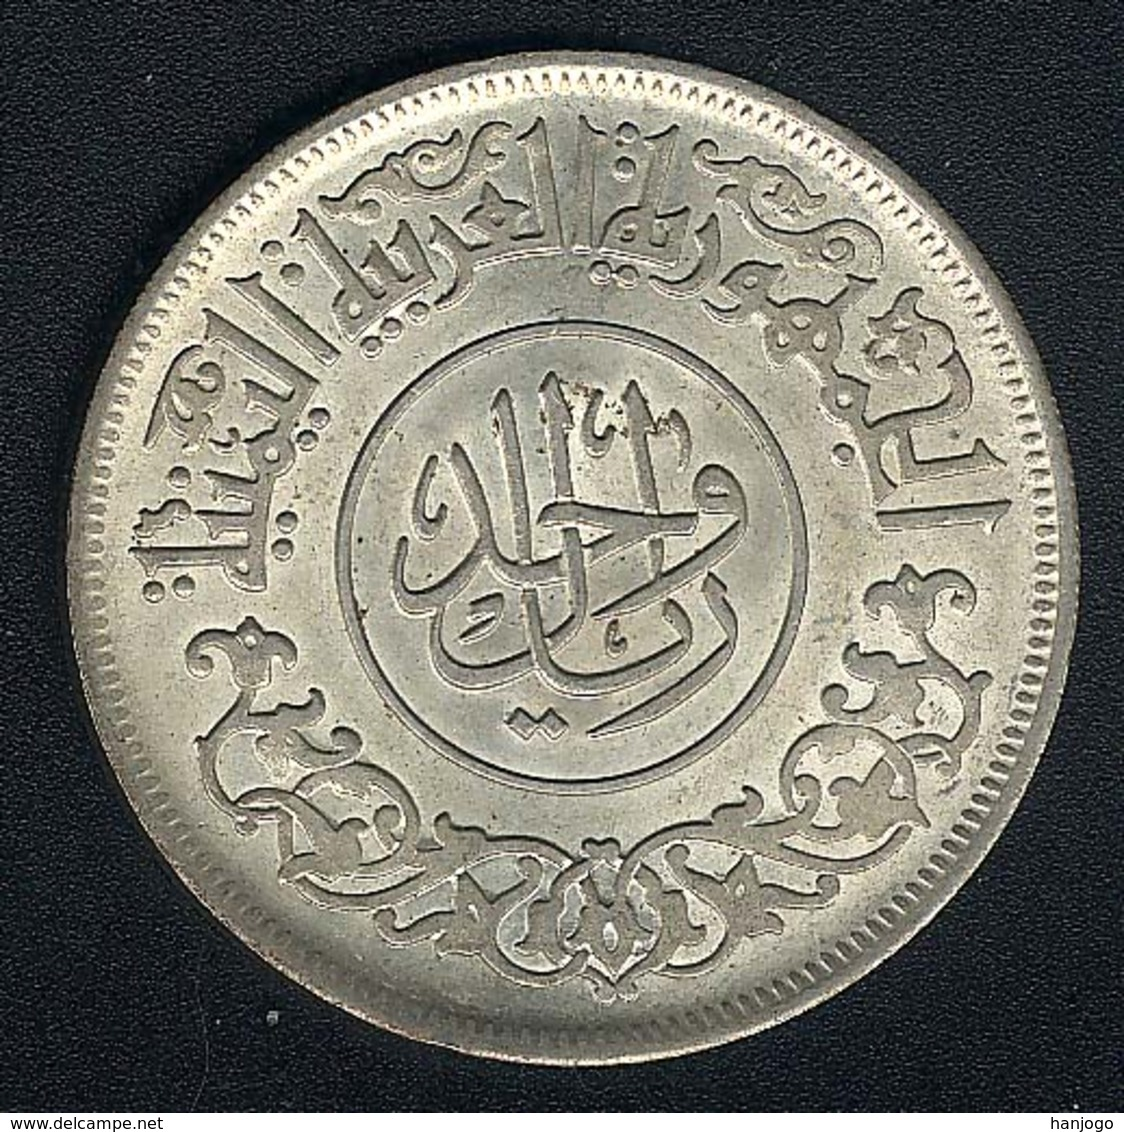 Jemen, 1 Rial 1963, Silber, AUNC - Jemen